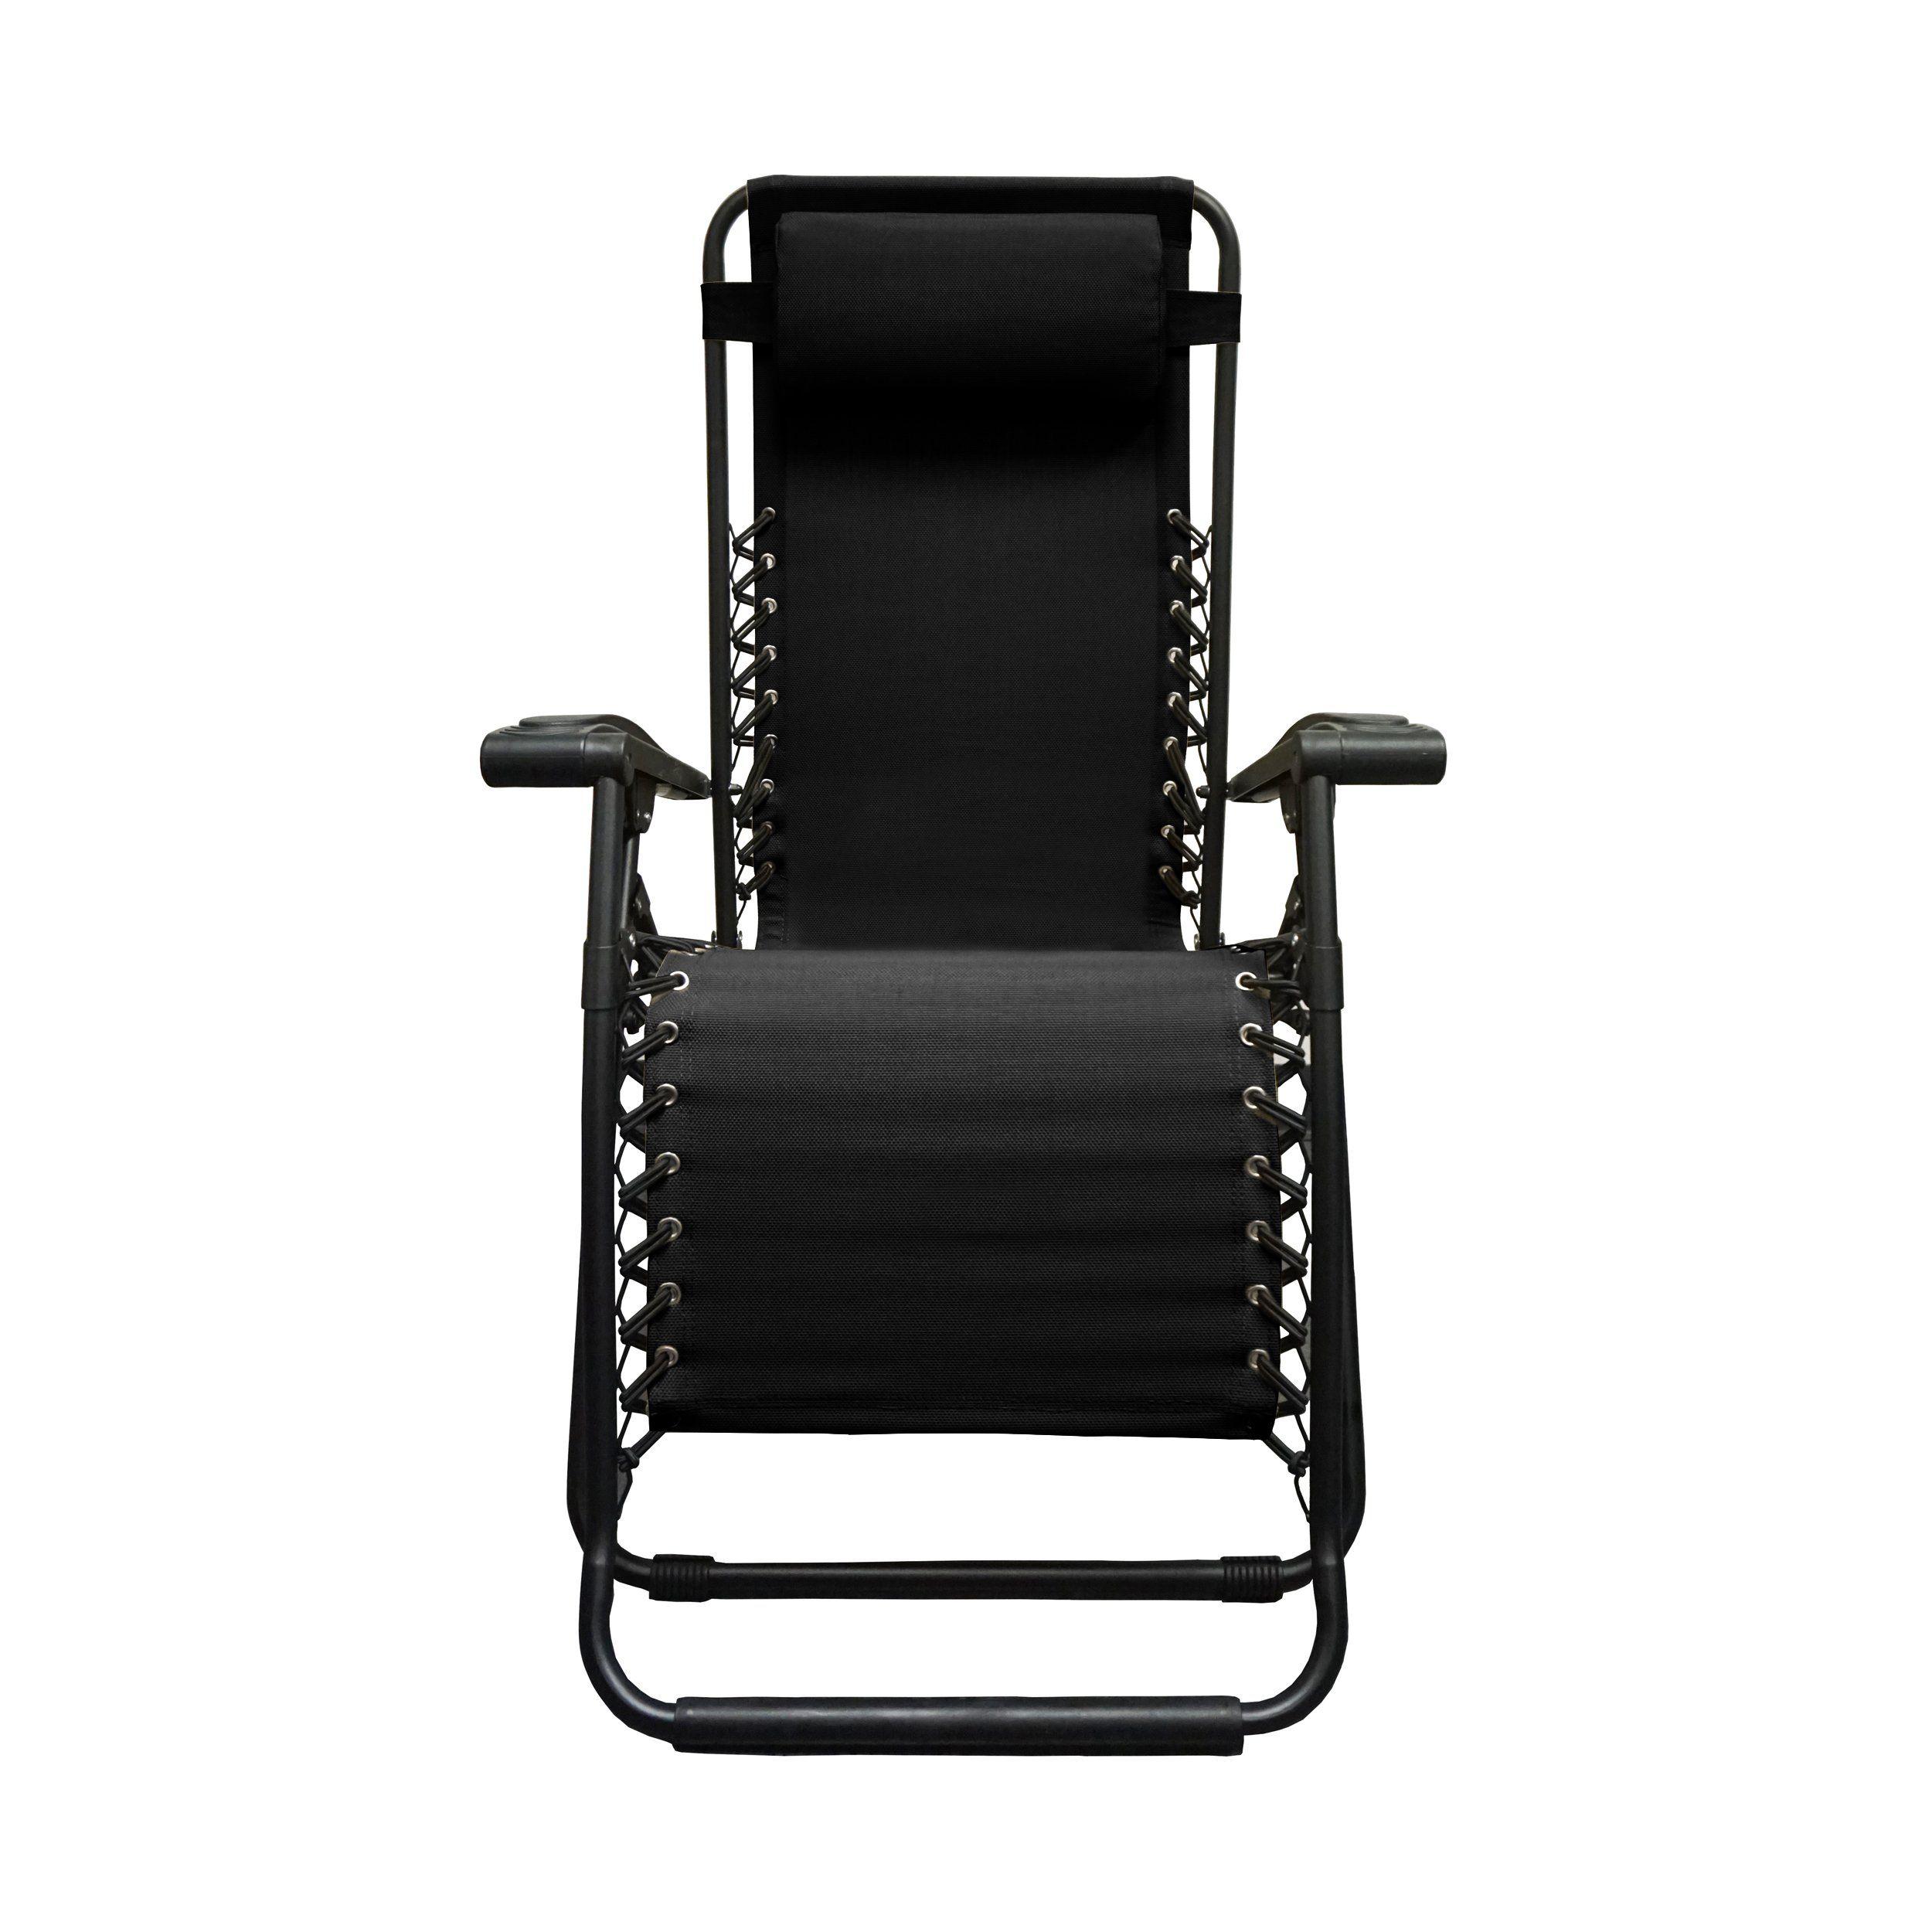 Caravan Sports Infinity Zero Gravity Chair Black * To view